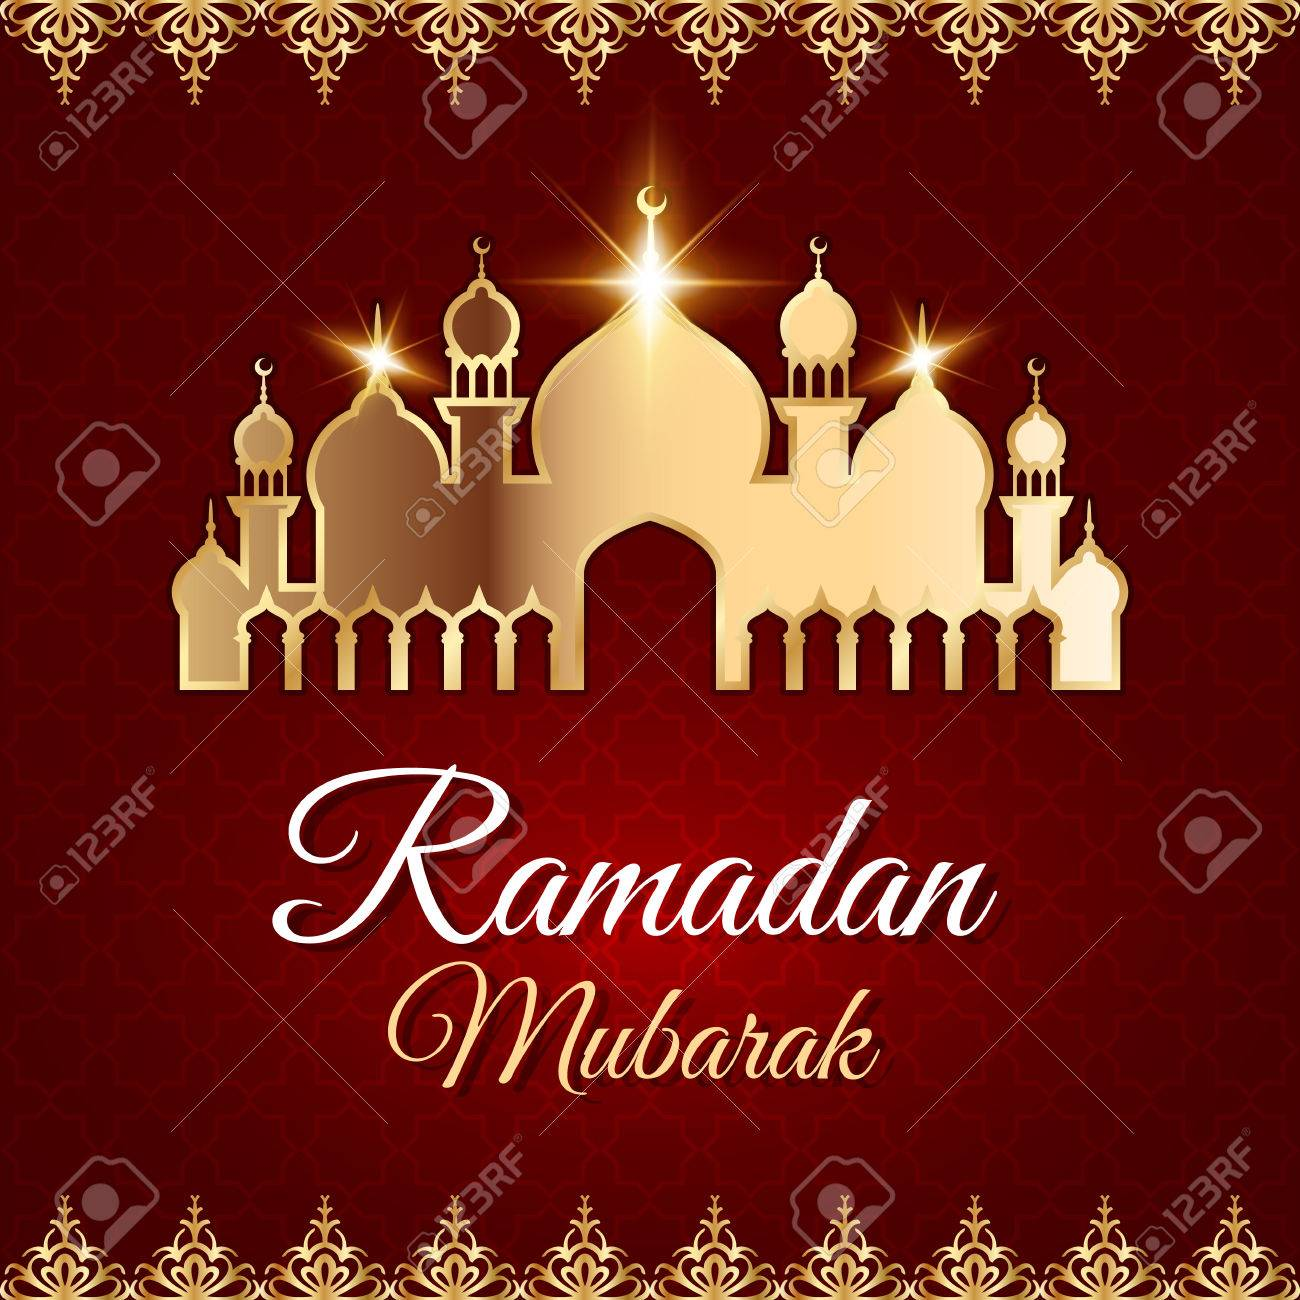 Ramadan mubarak greeting card with golden mosque dark red vector ramadan mubarak greeting card with golden mosque dark red vector islamic background stock vector kristyandbryce Image collections